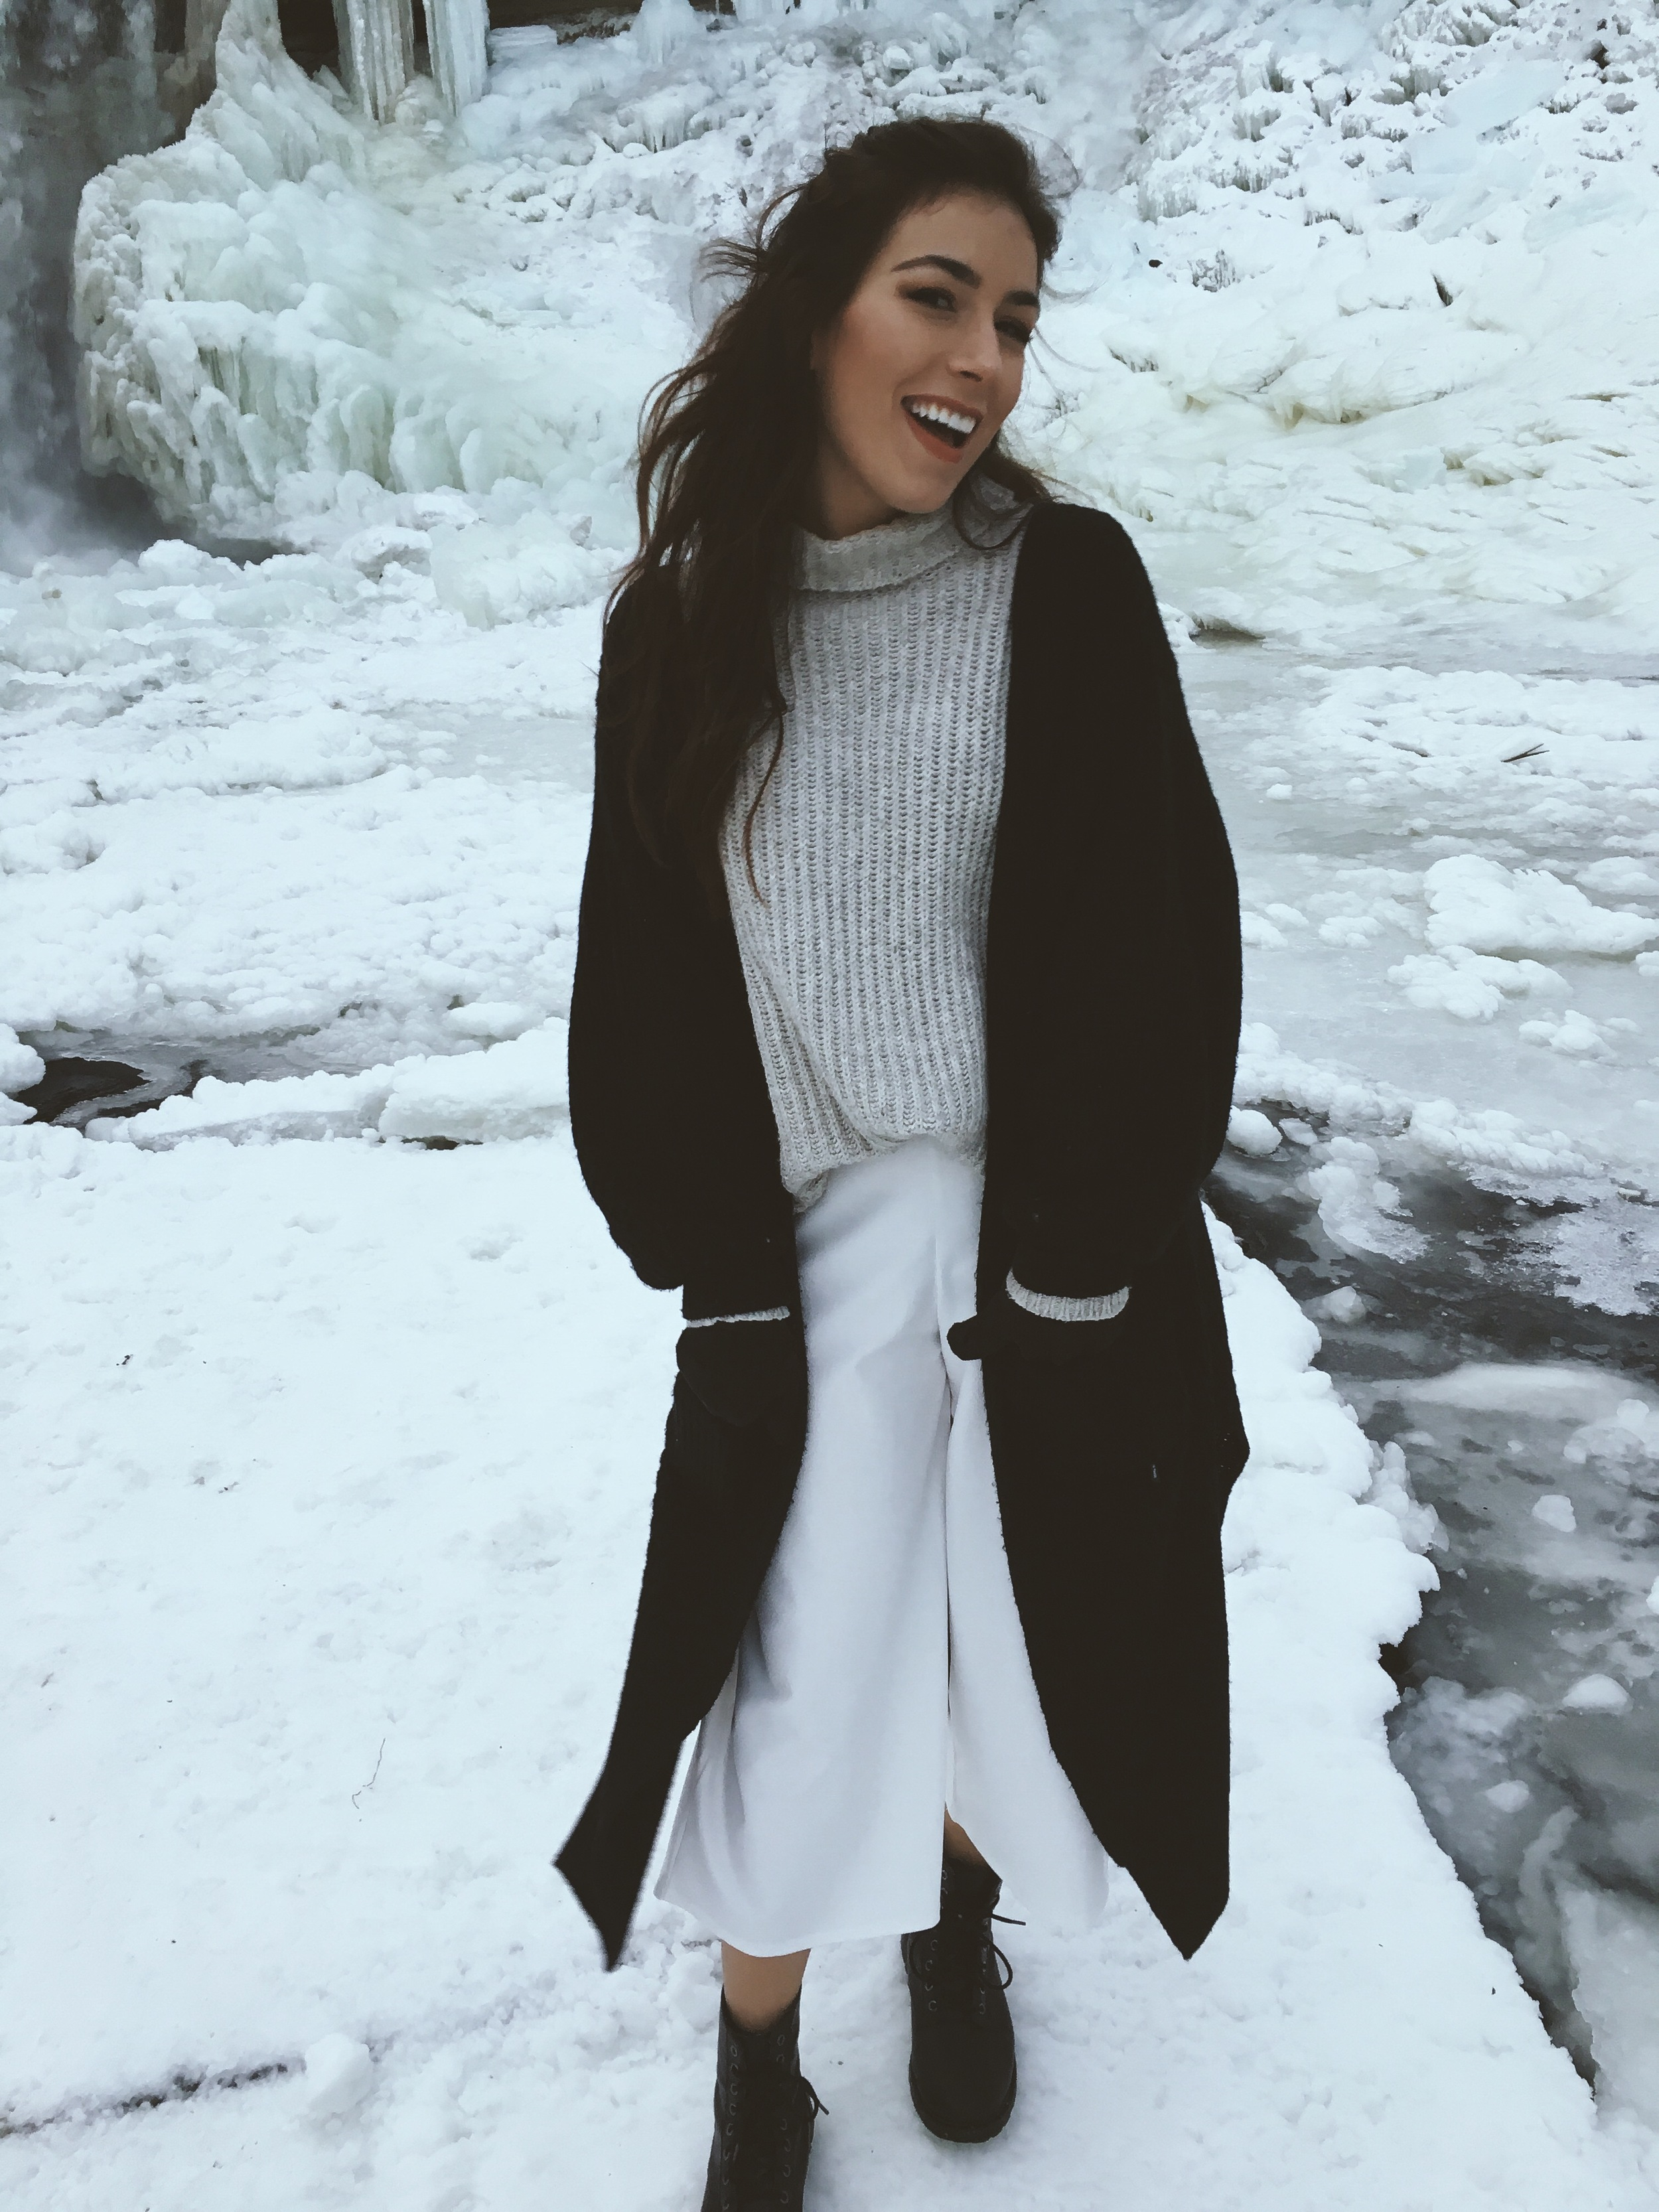 TaylorKnox_Waterfalls8